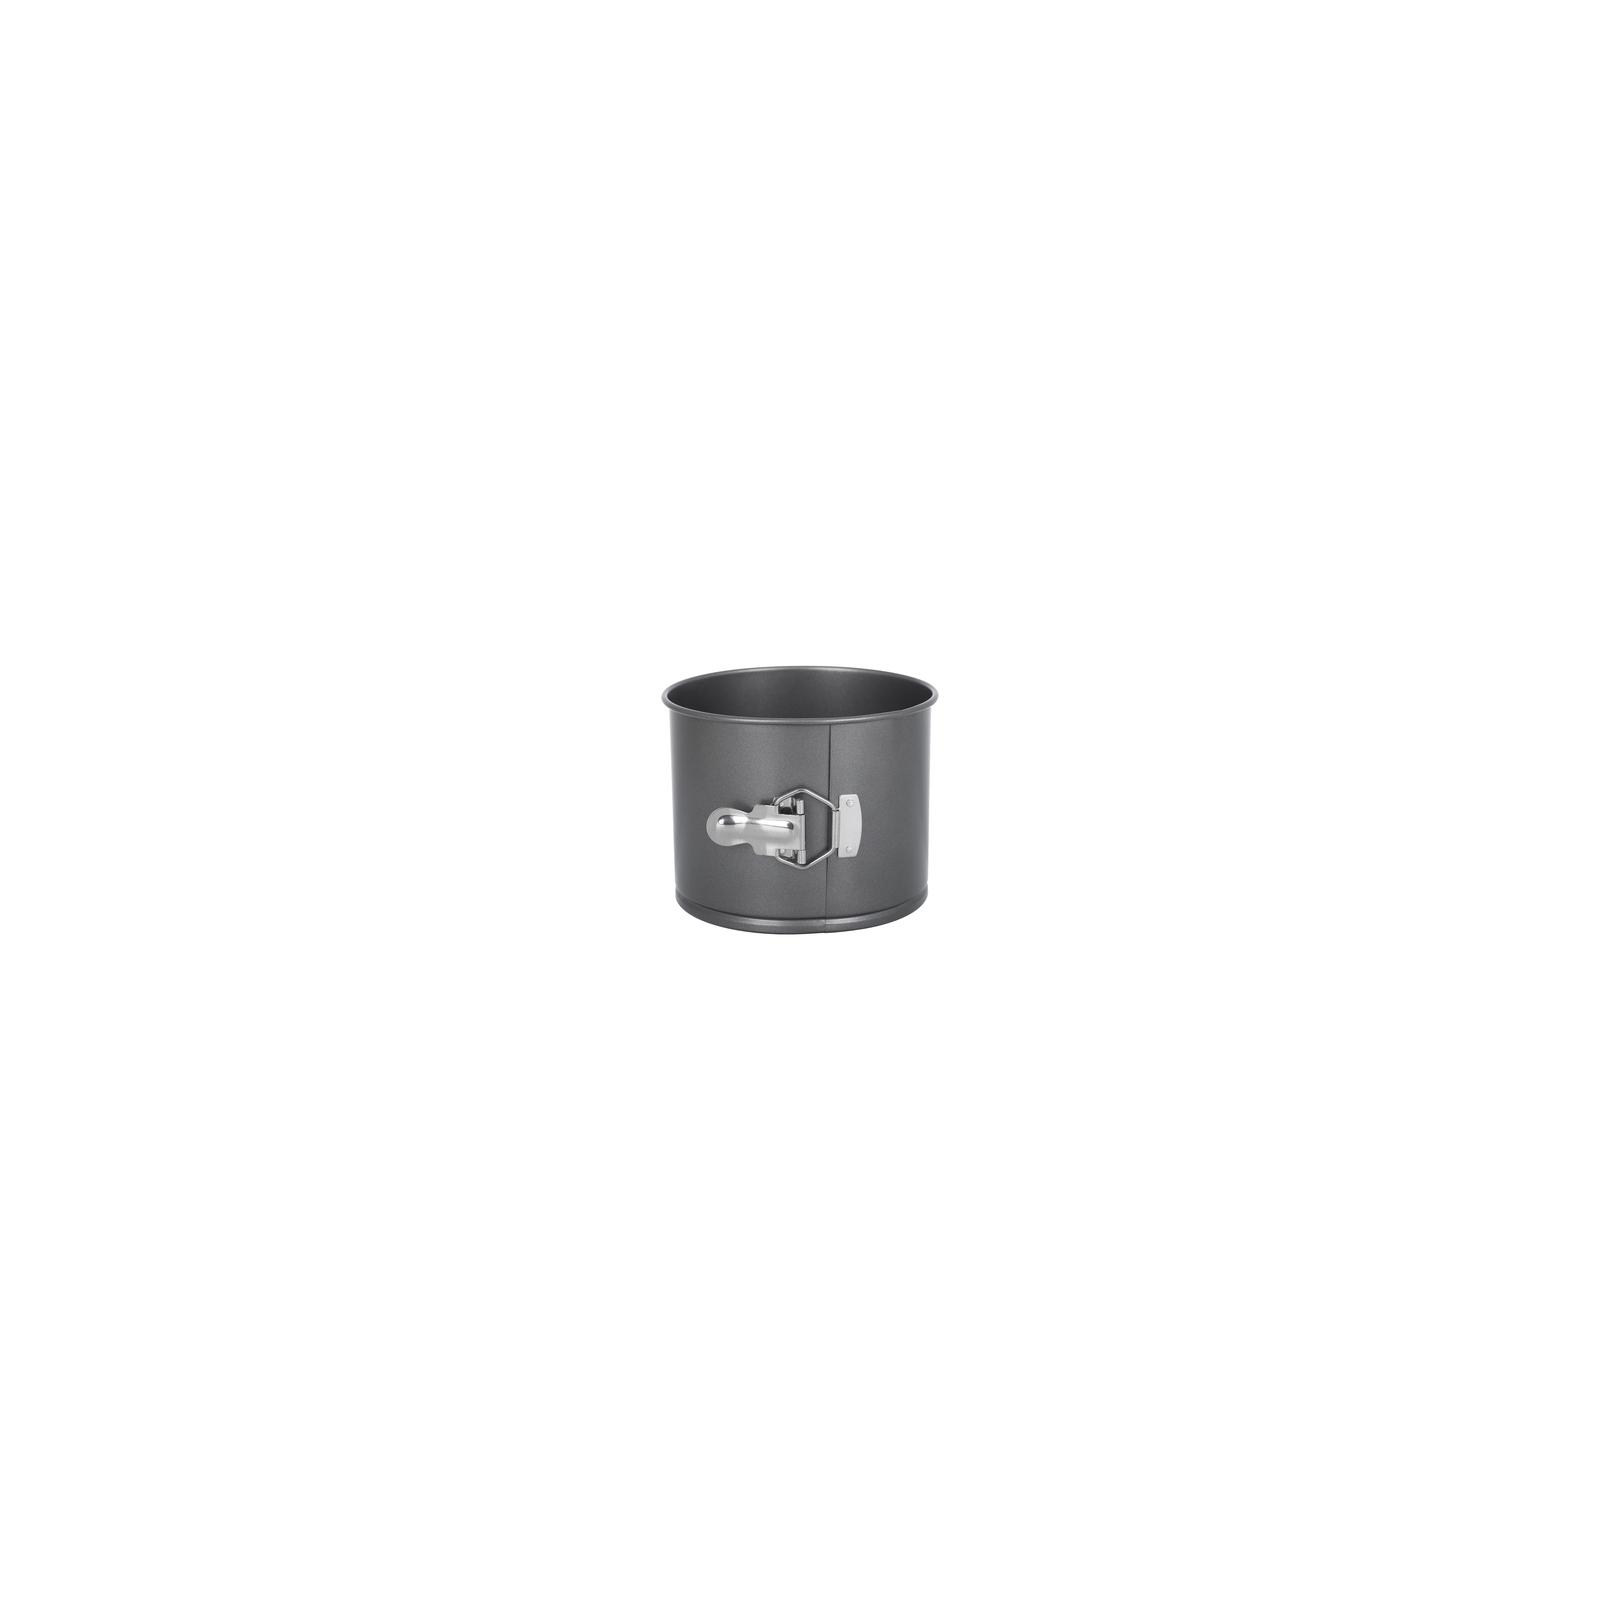 Форма для выпечки Ringel Strudel для паски, разъмная 16 x 13 см (RG-10213-16)